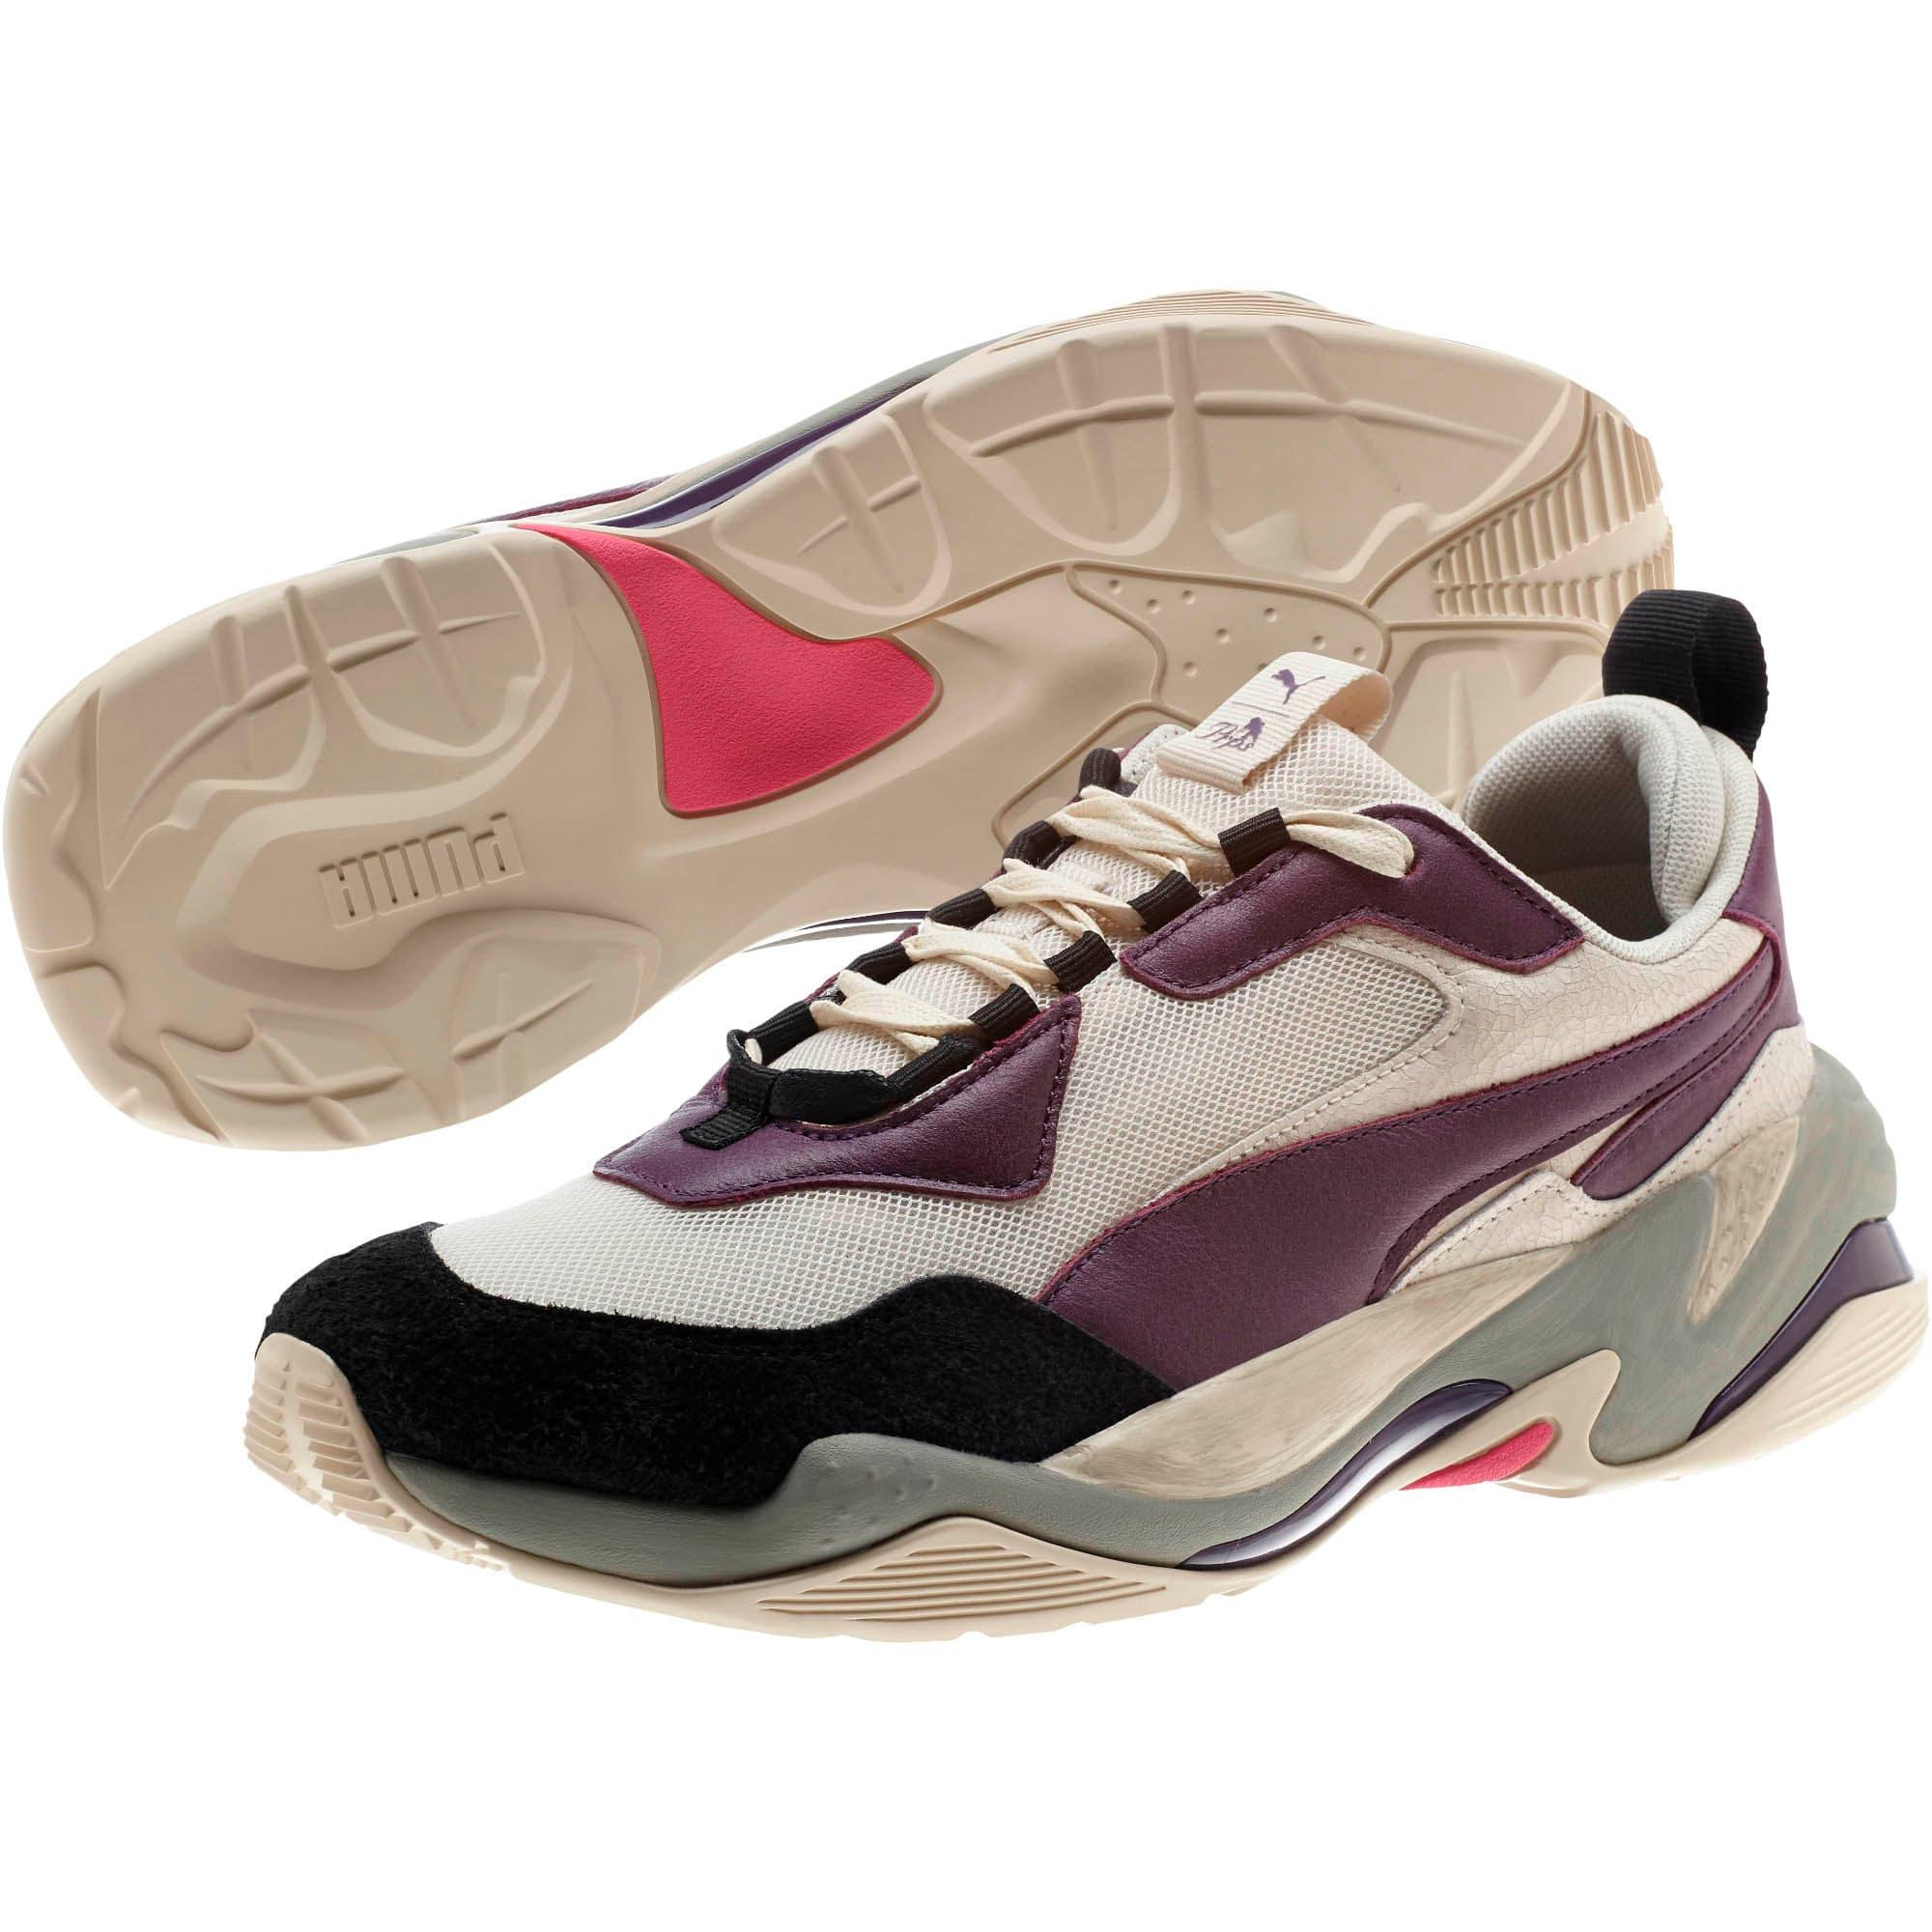 Thumbnail 2 of Thunder x PRPS Sneakers, Birch- Black-Indigo, medium